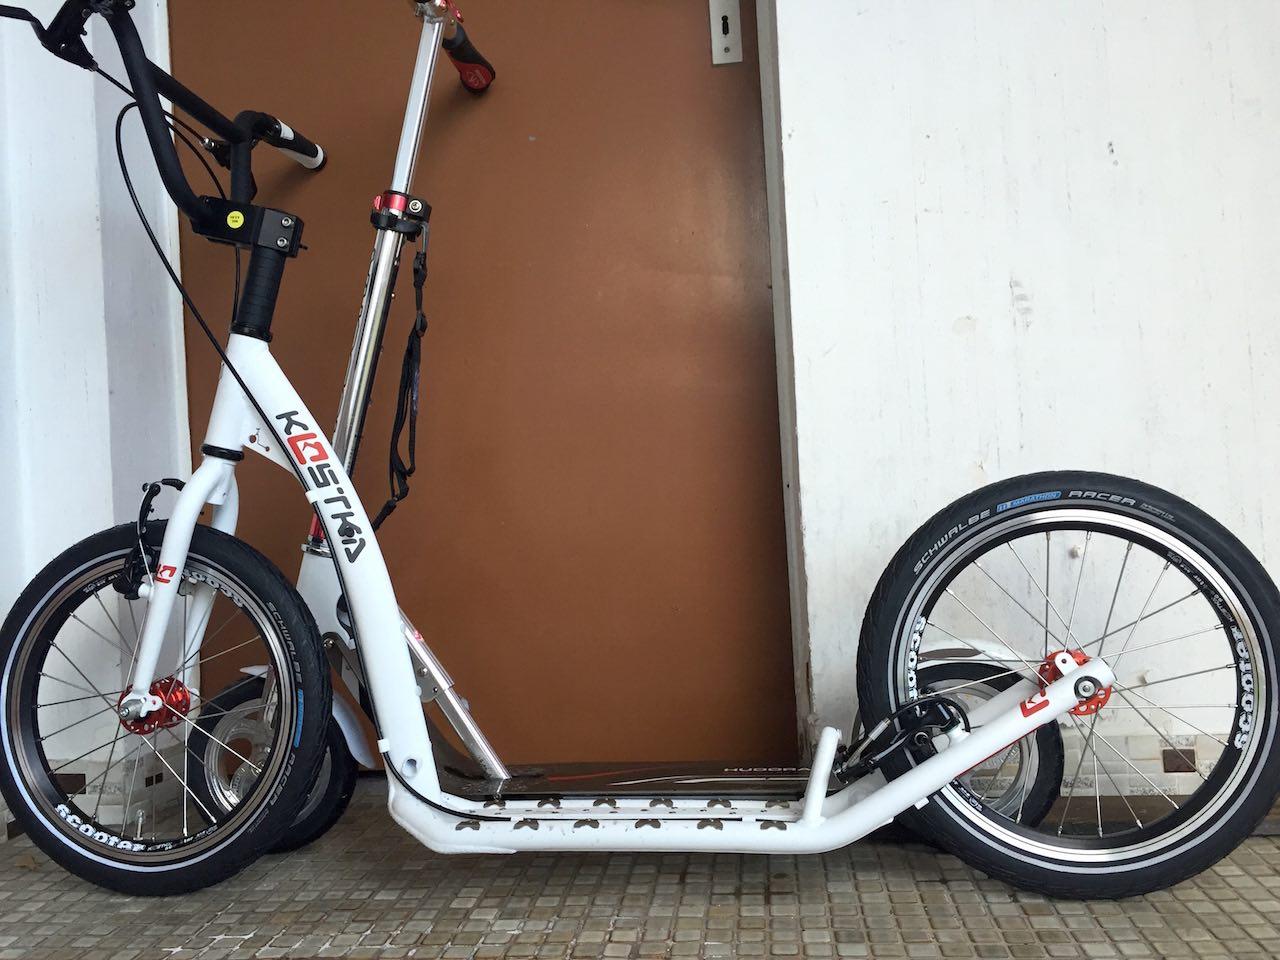 kostka-street-fold-vs-hudora-bigwheel-air-9